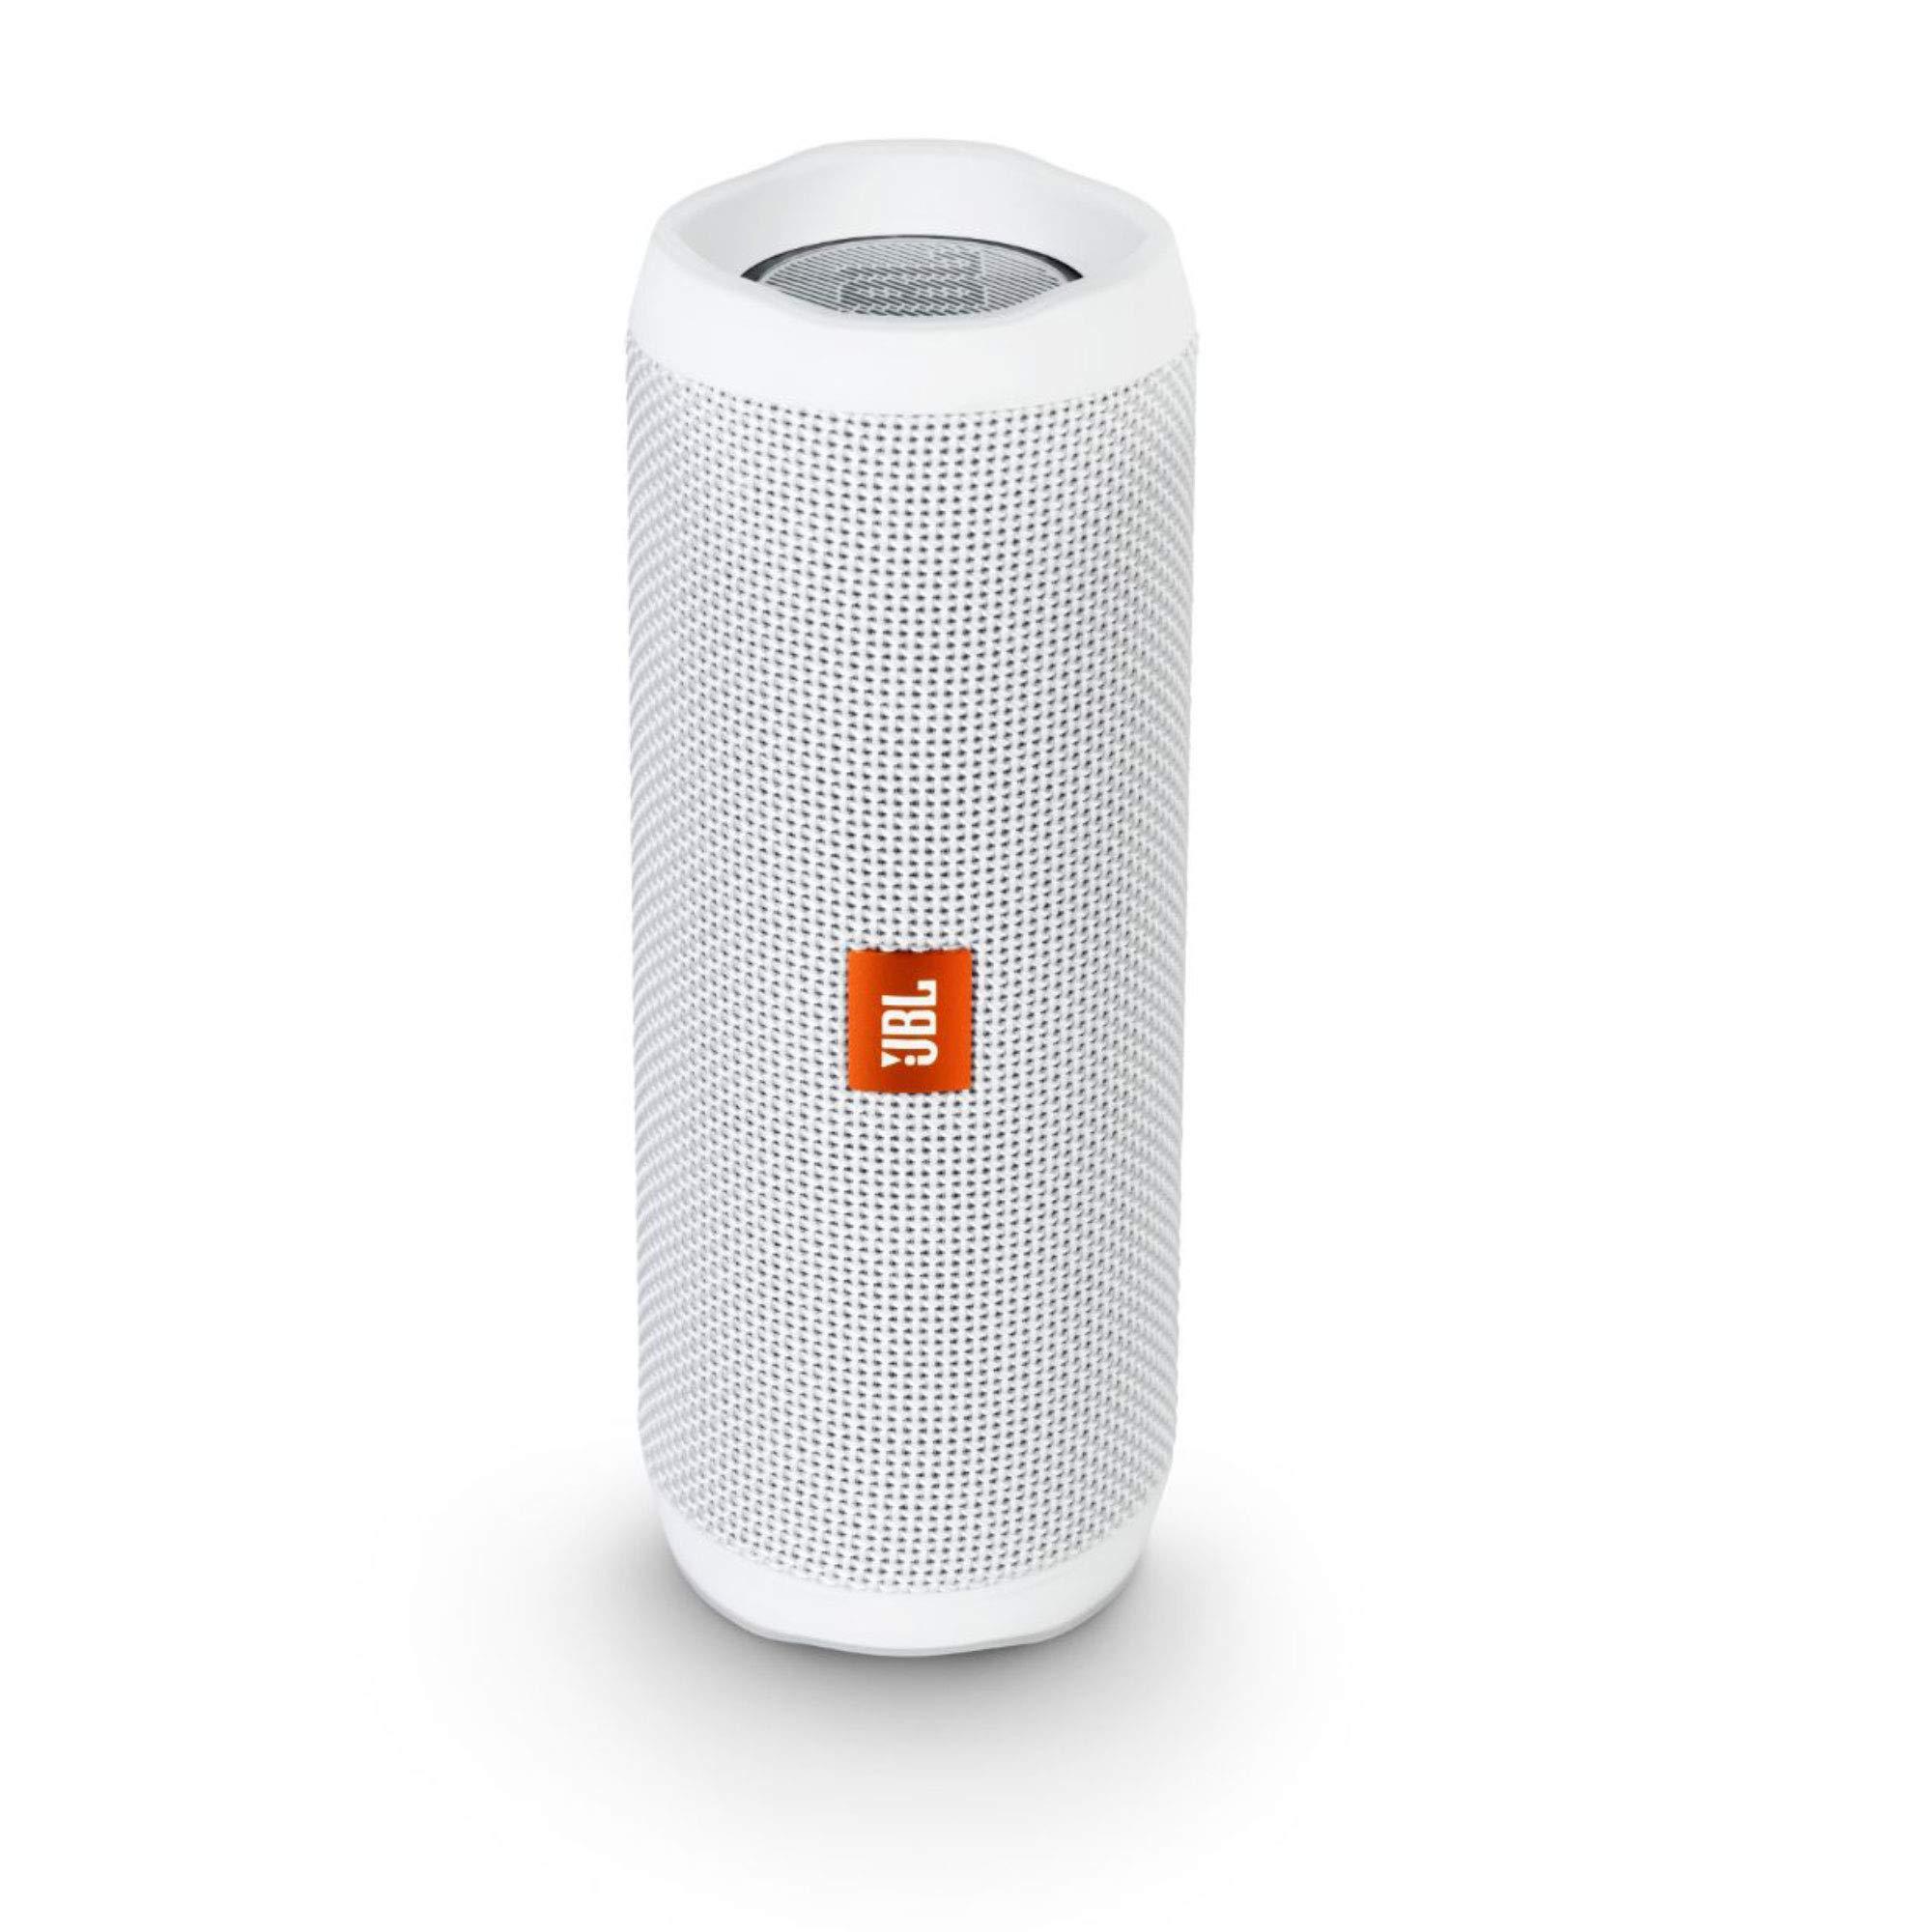 JBL Flip 4 Waterproof Portable Bluetooth Speaker - White by JBL